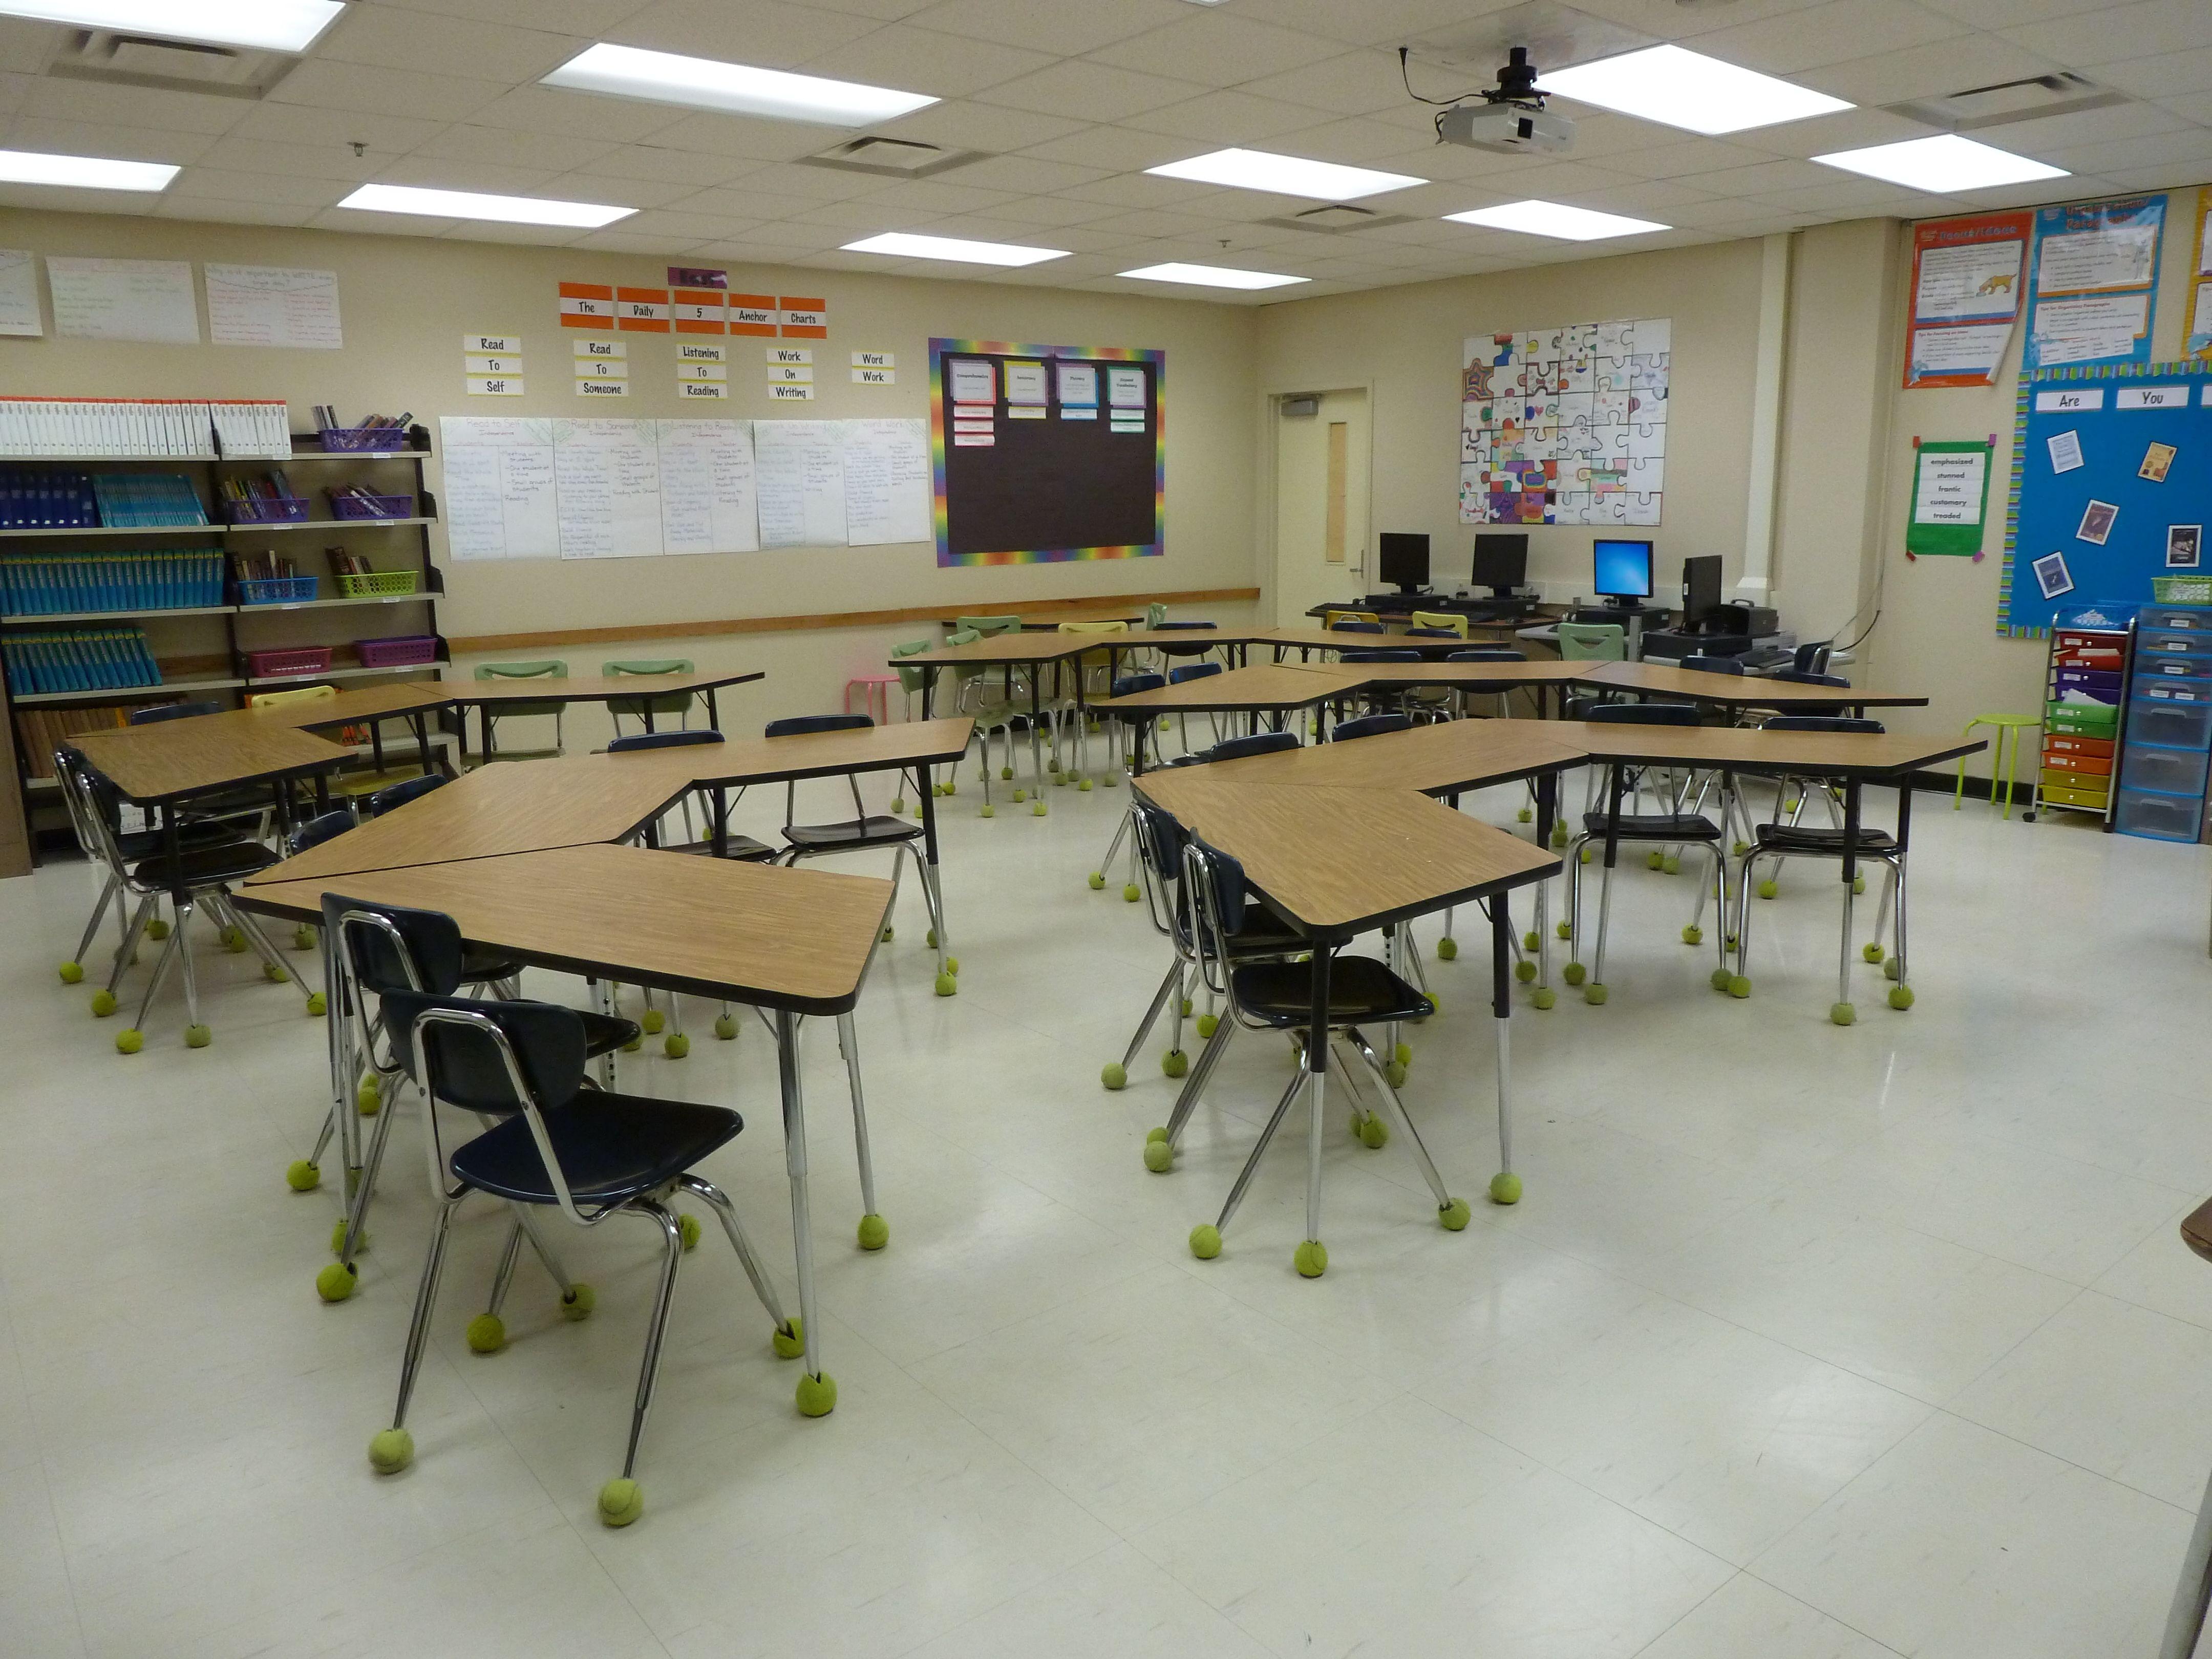 Trapezoid table classroom organization classroom desk - Interior arrangement and design association ...